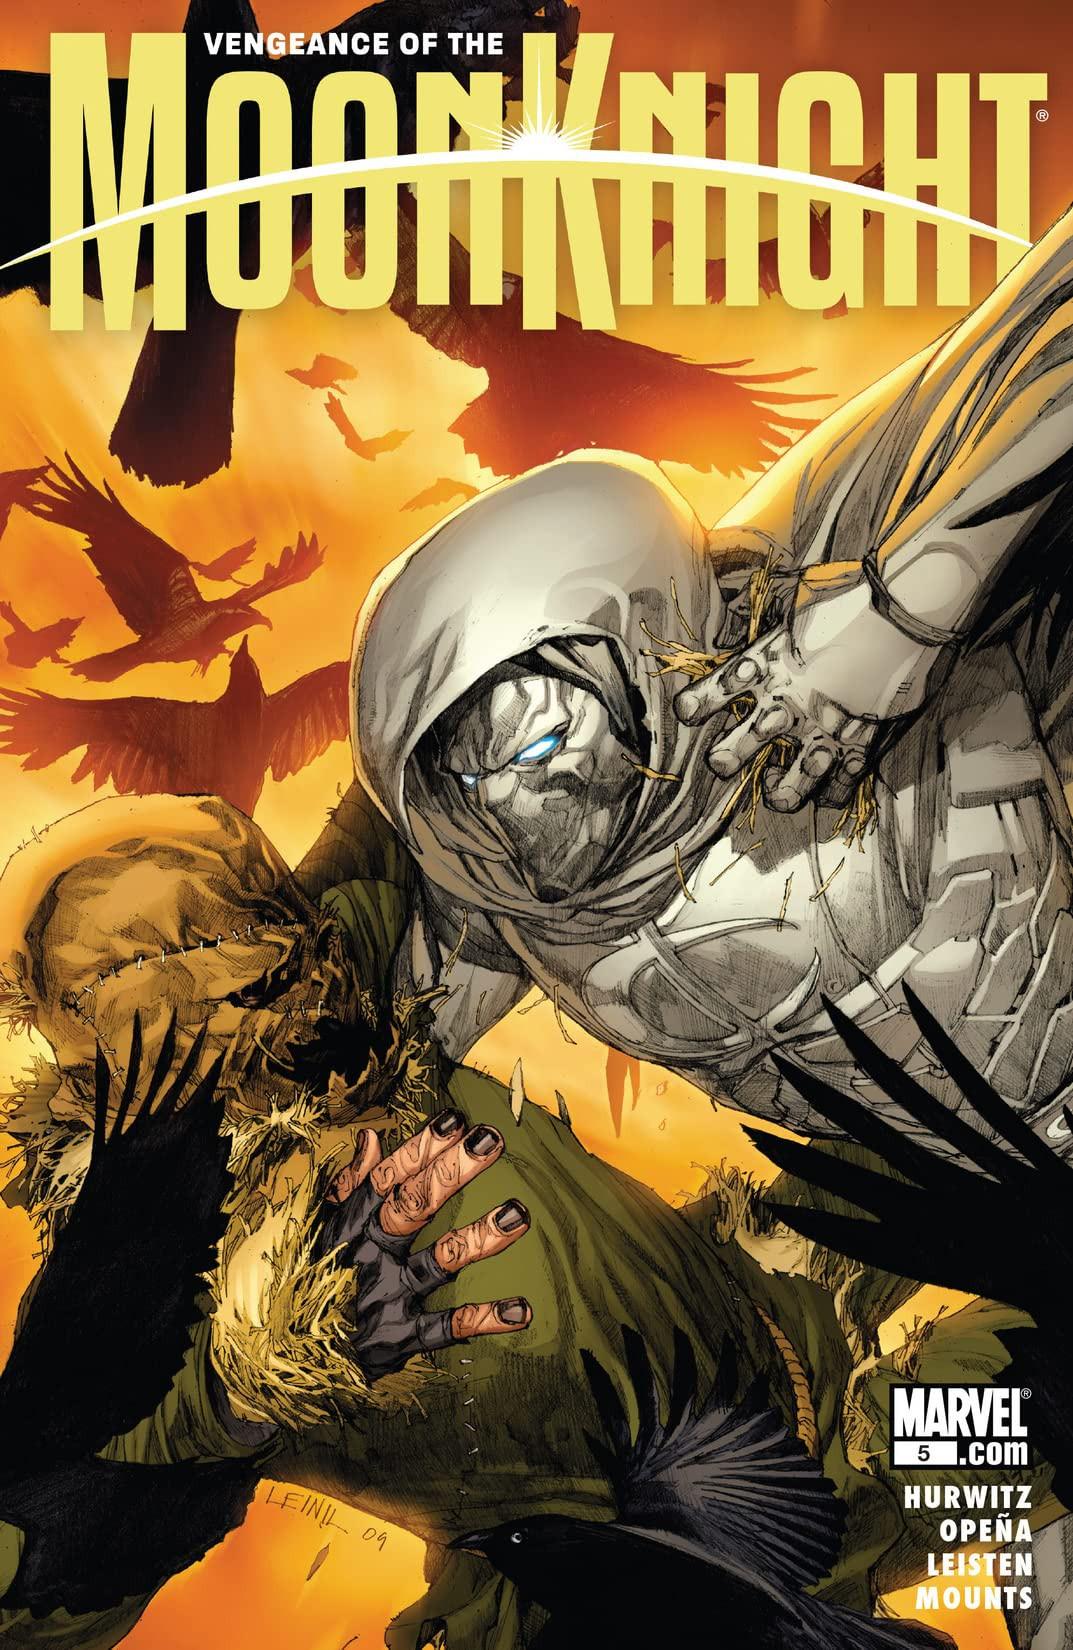 Vengeance of the Moon Knight Vol 1 5.jpg